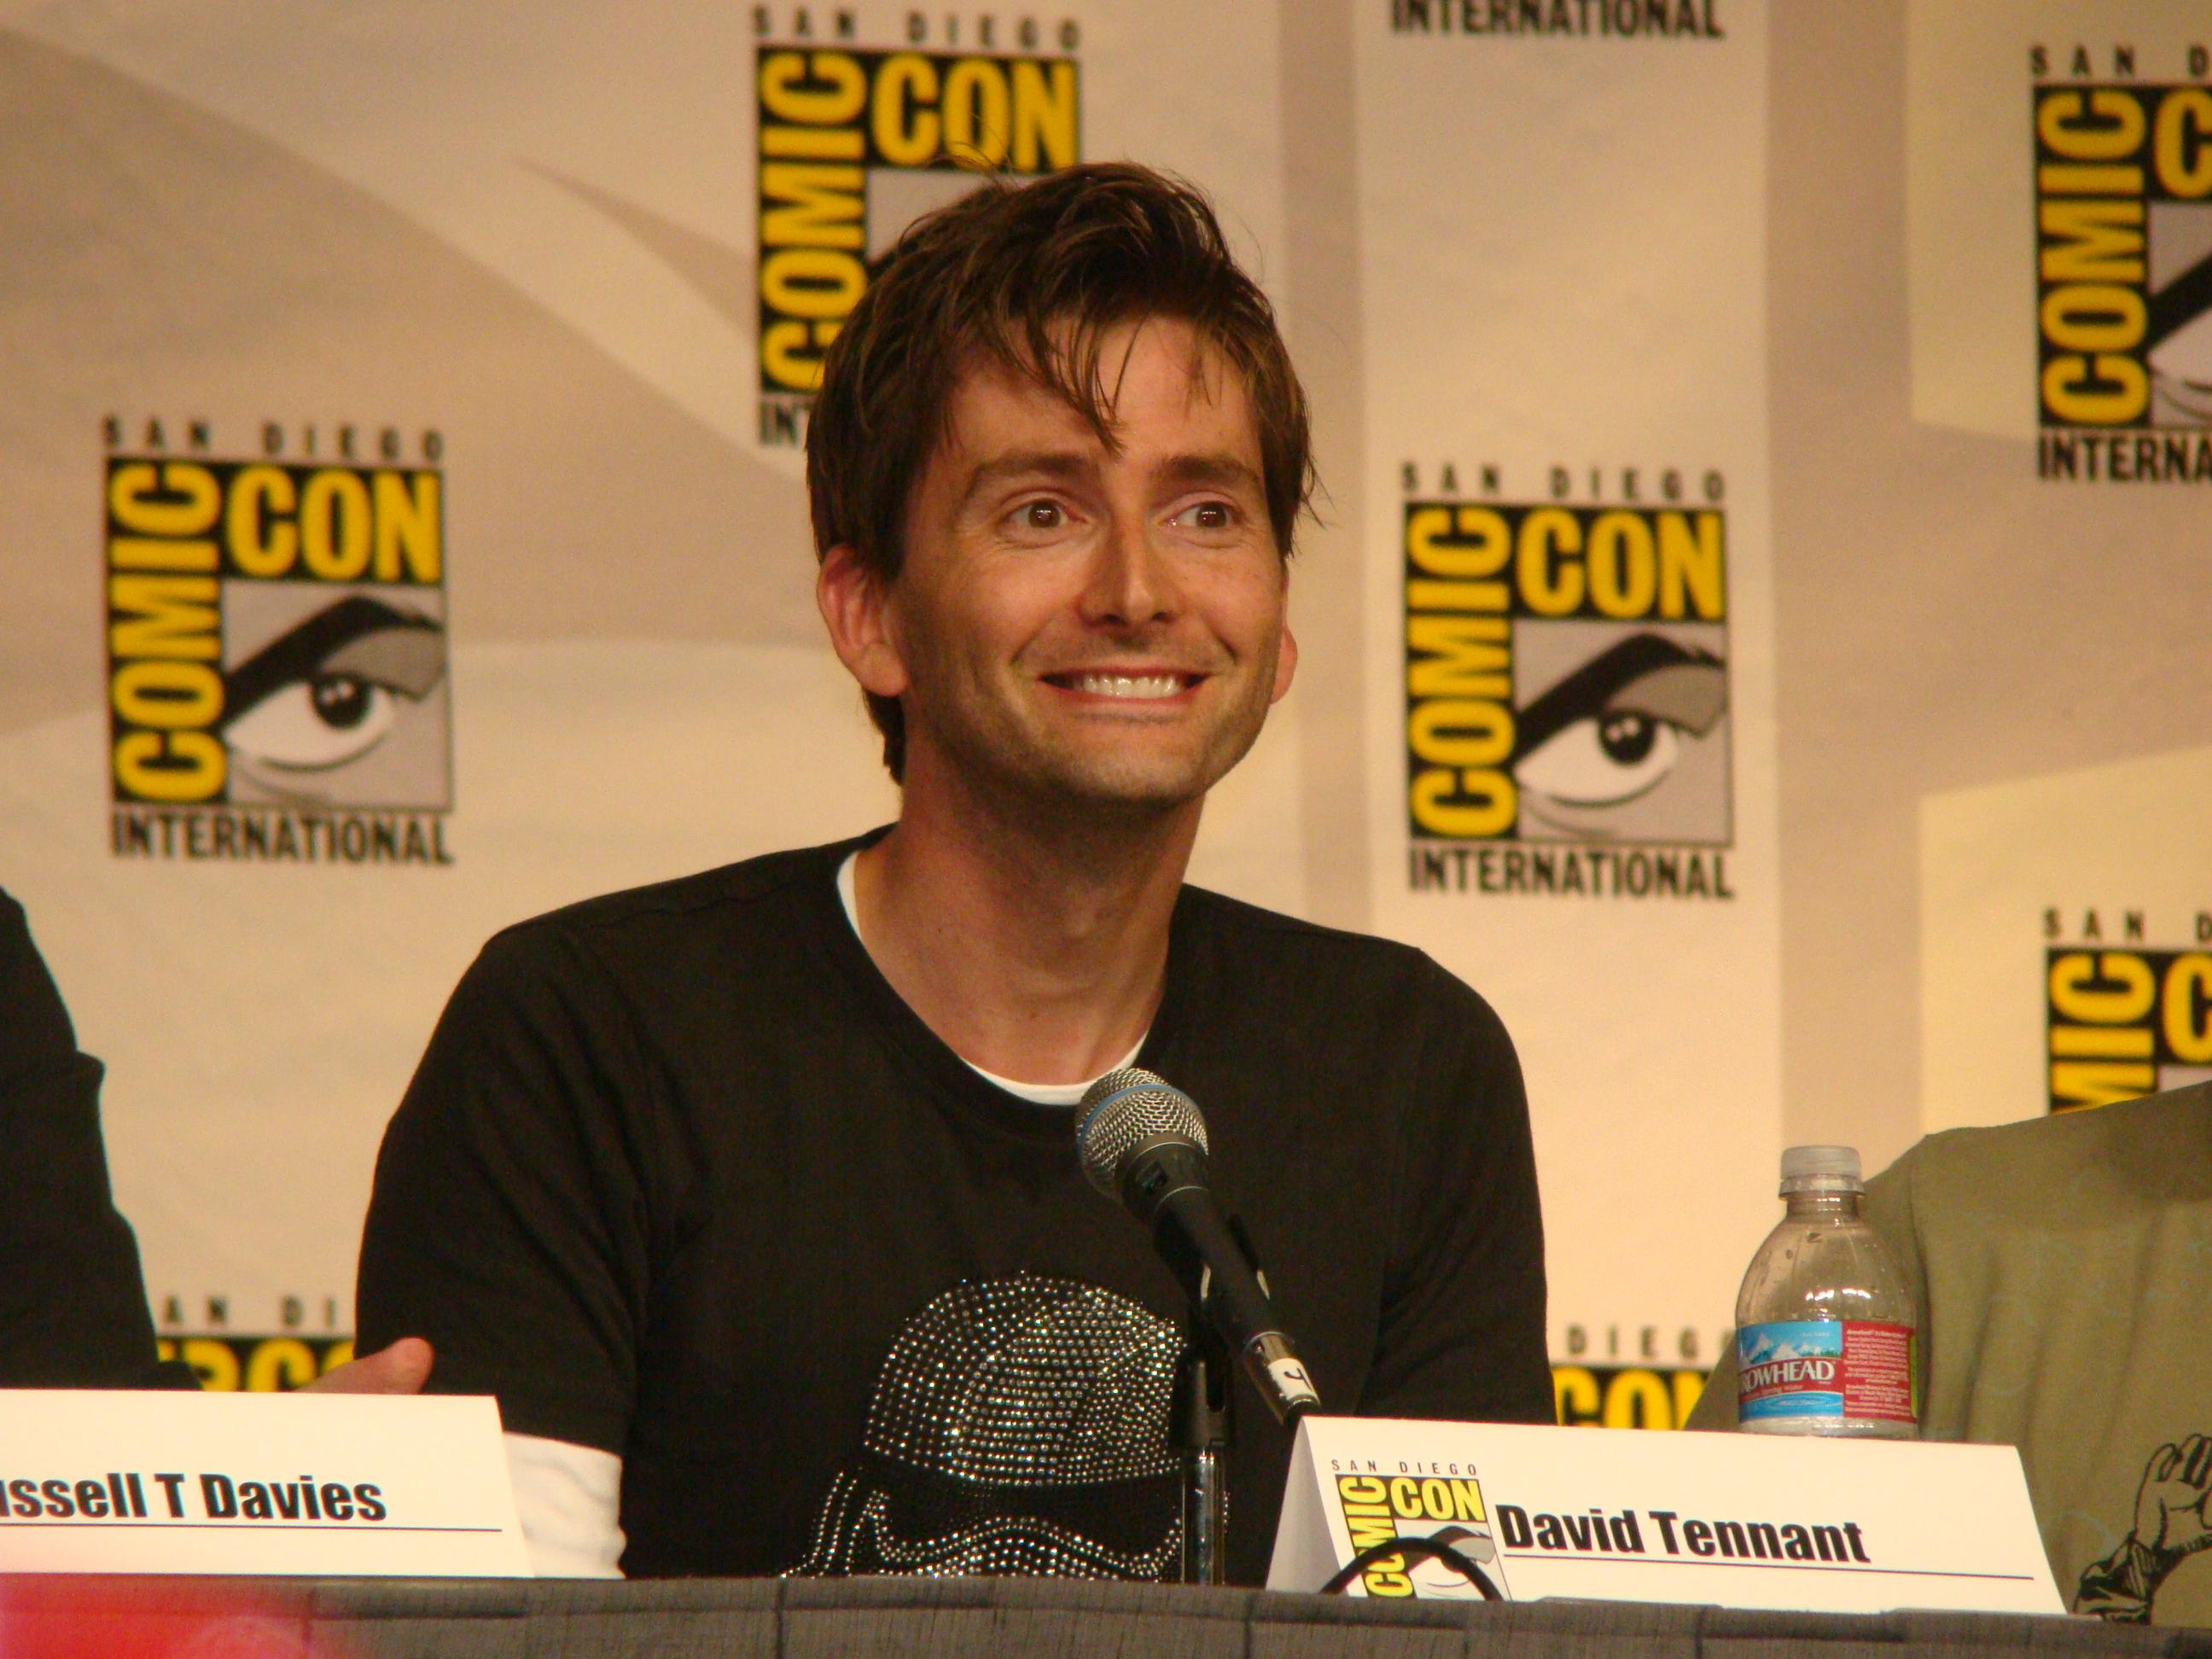 File:2009 07 31 David Tennant smile 06.jpg - Wikimedia Commons